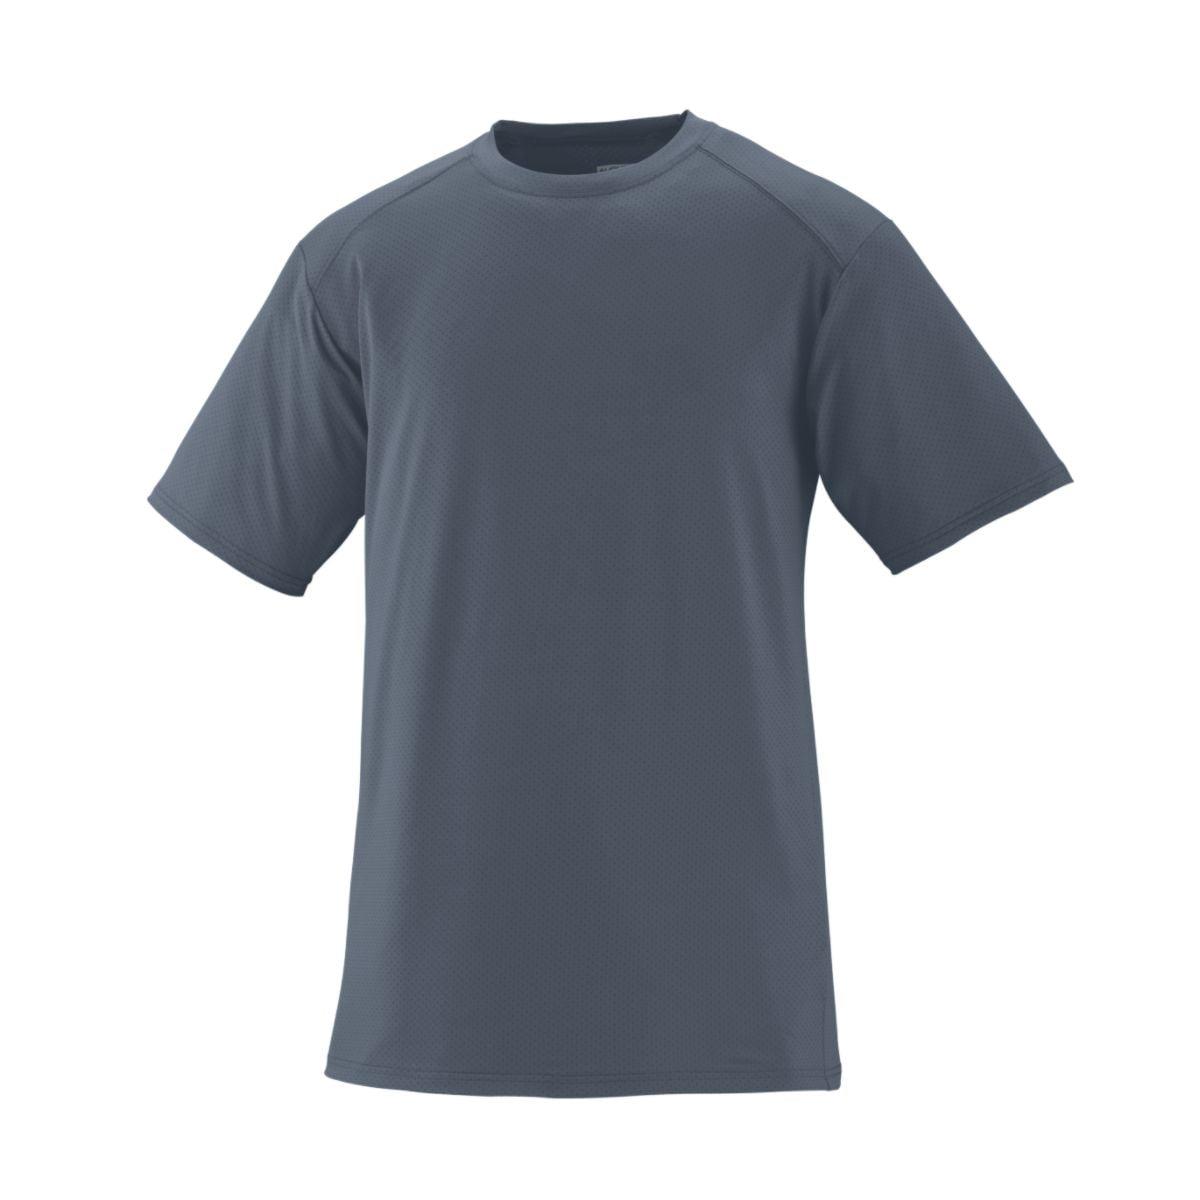 Augusta Sportswear Men's Exa Short Sleeve Crew S Graphite - image 1 of 1